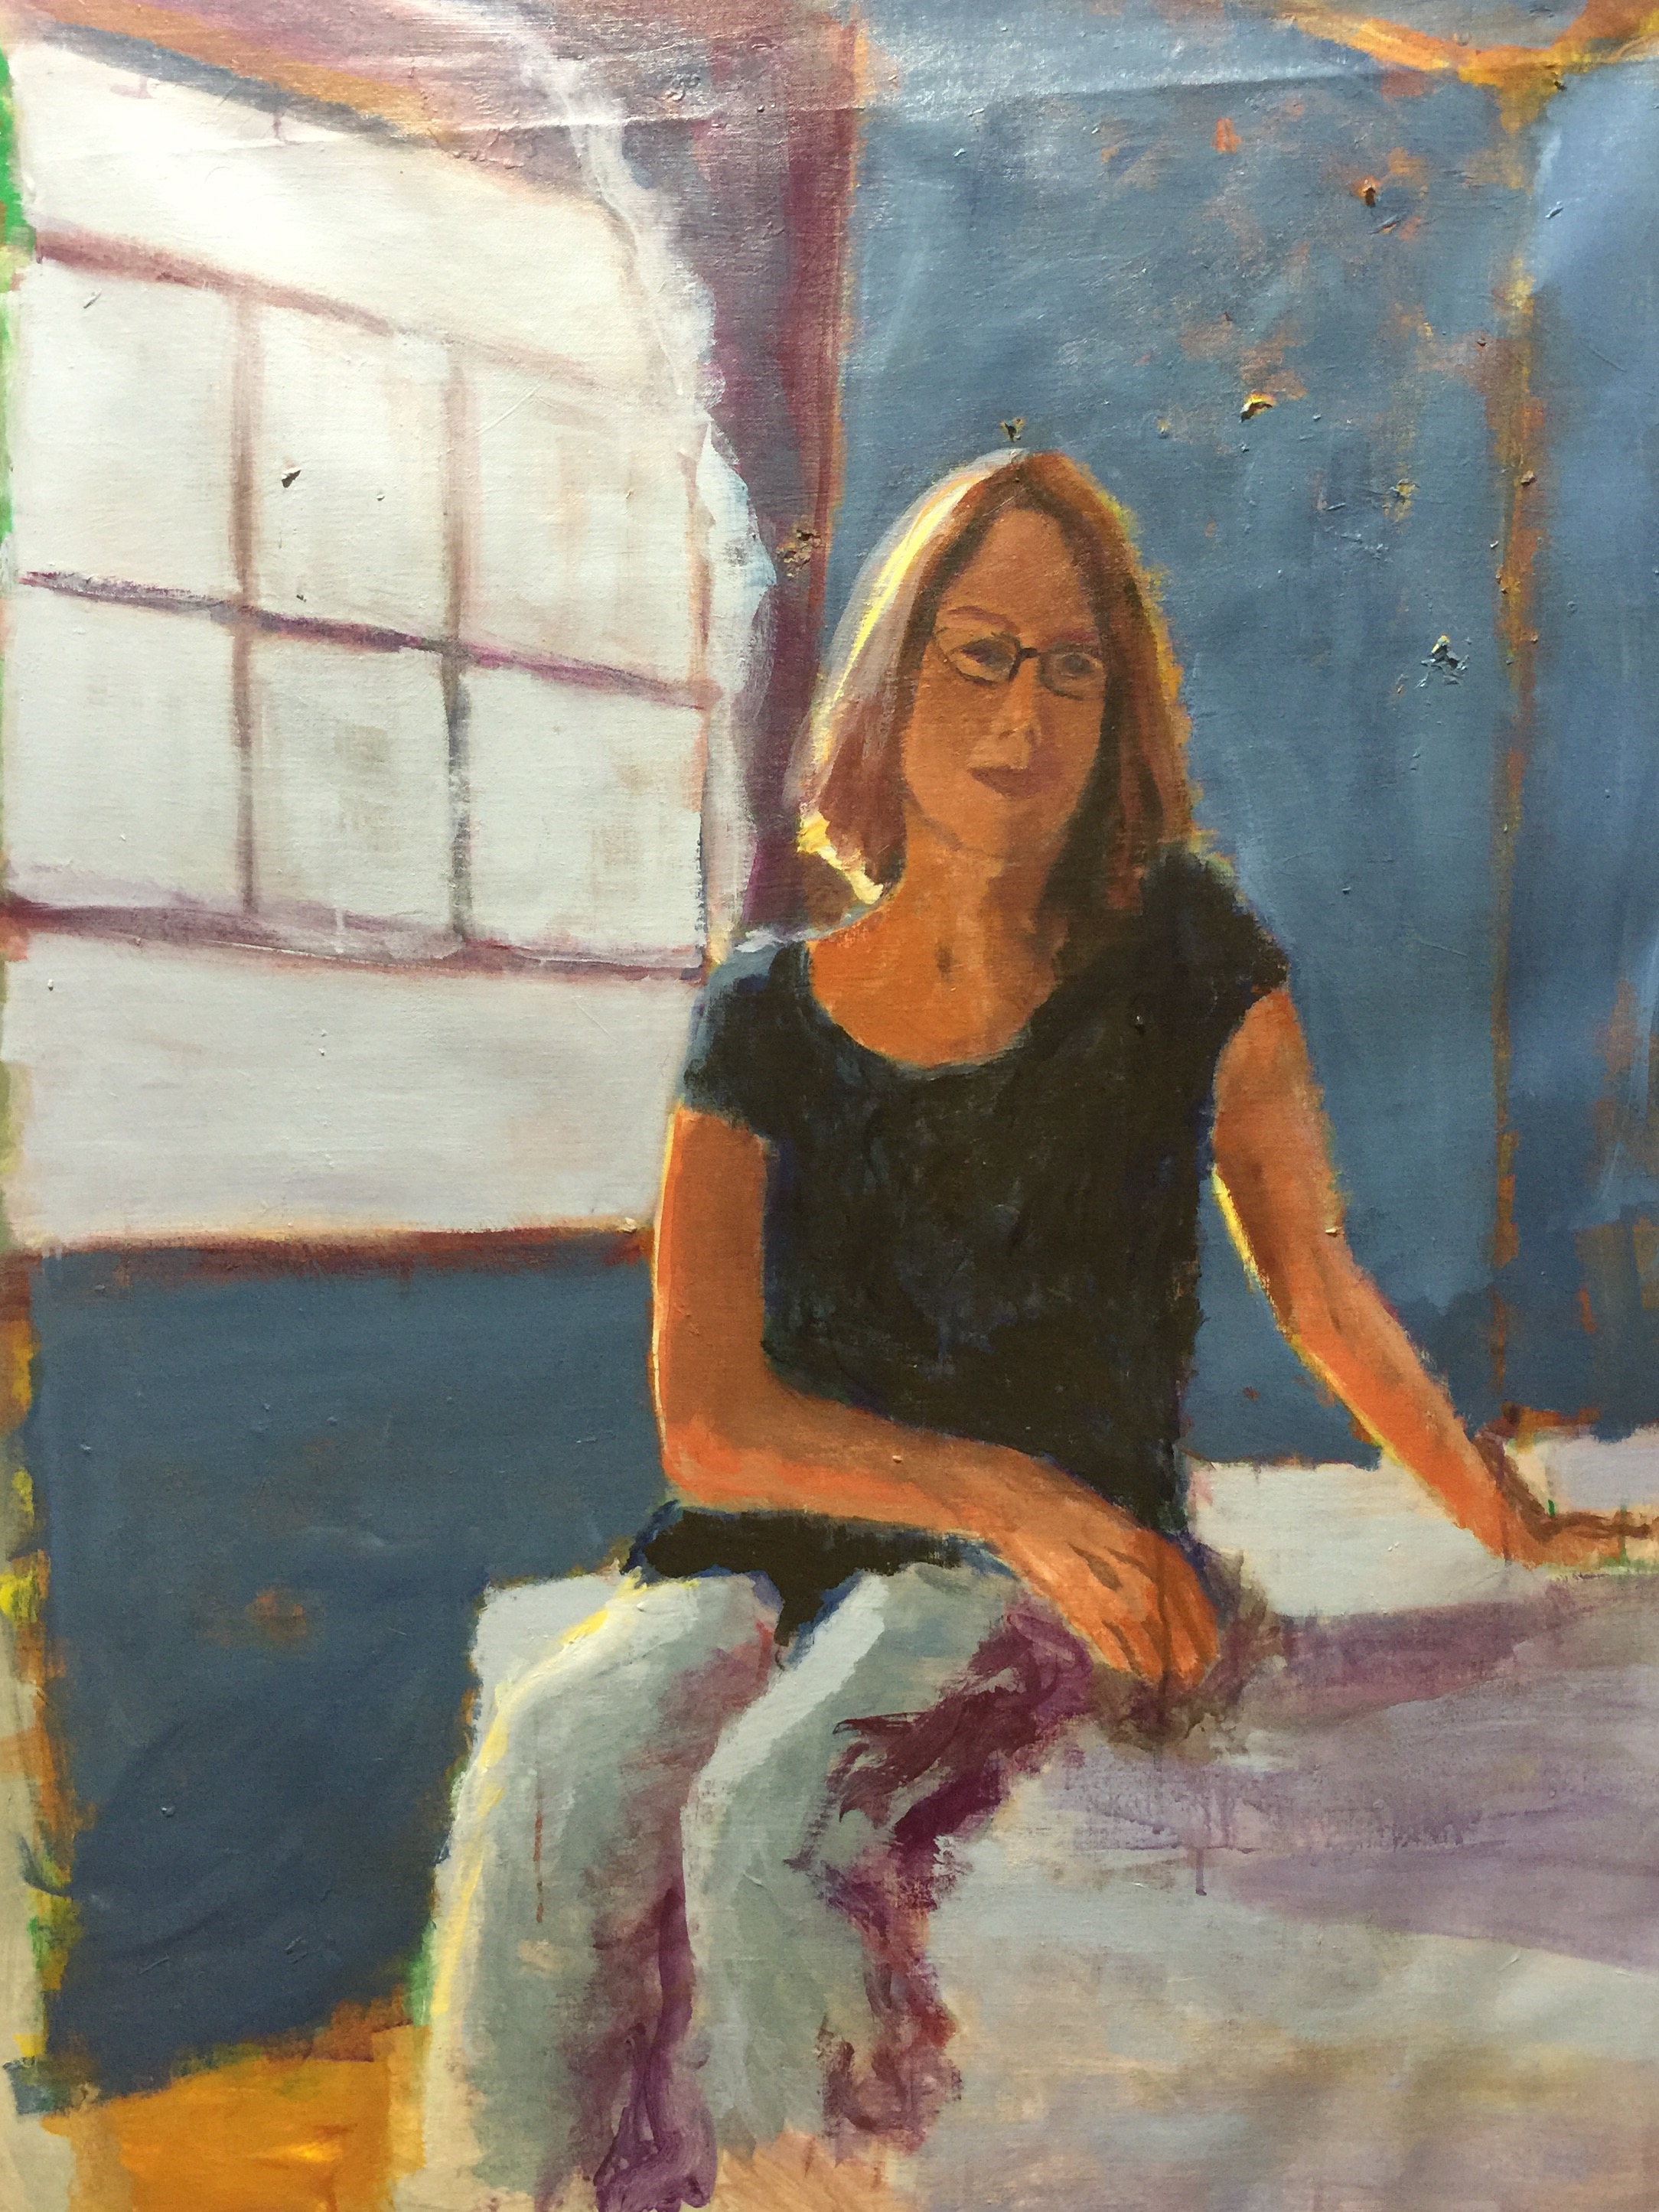 #workinprogress portrait of Amelia